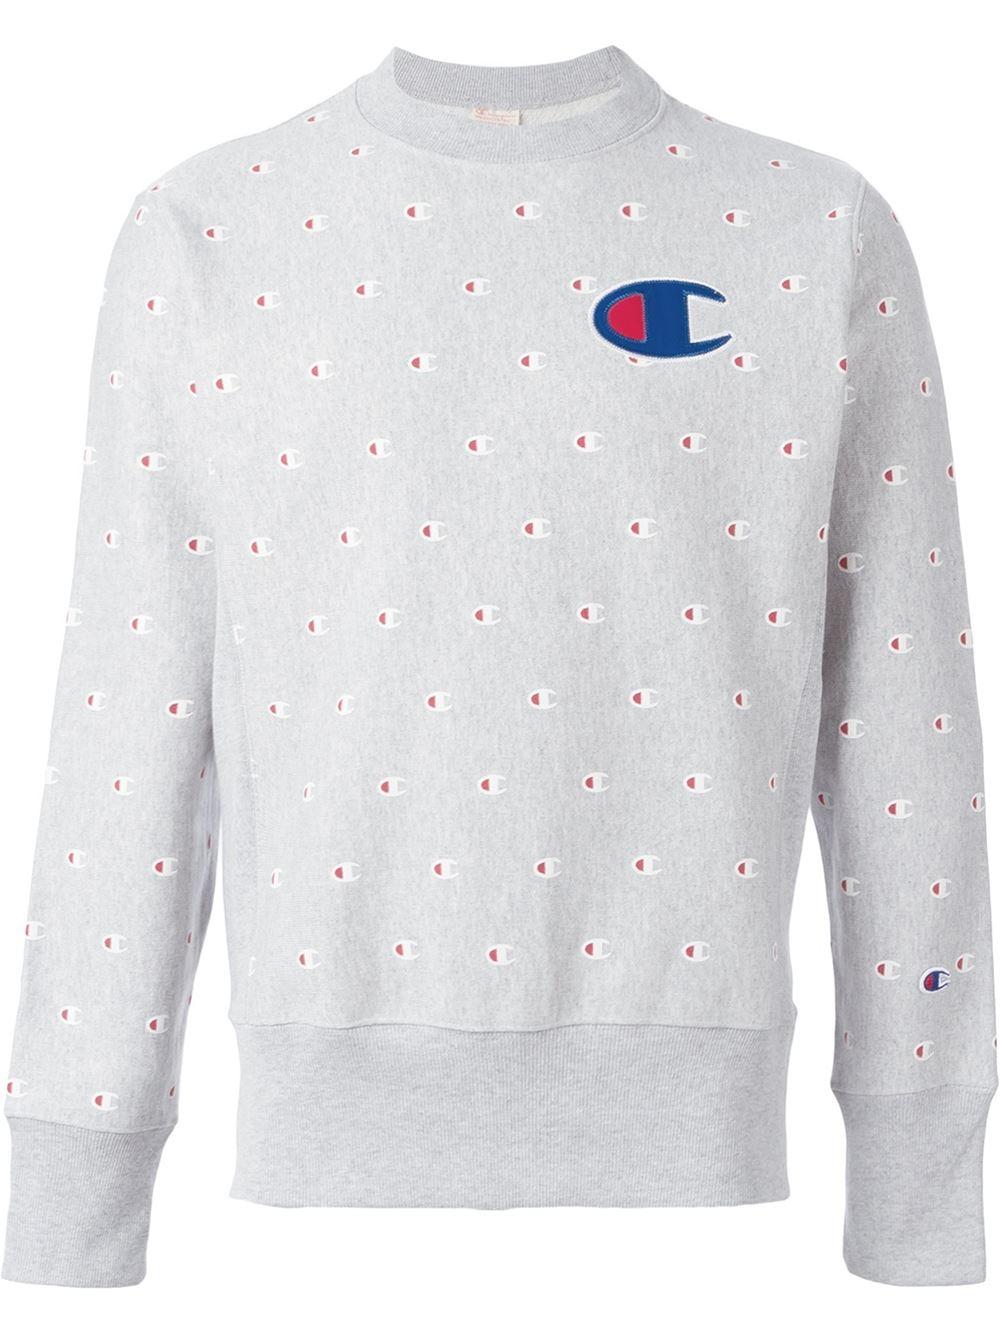 White Champion Sweater Photo Album - Fashion Trends and Models